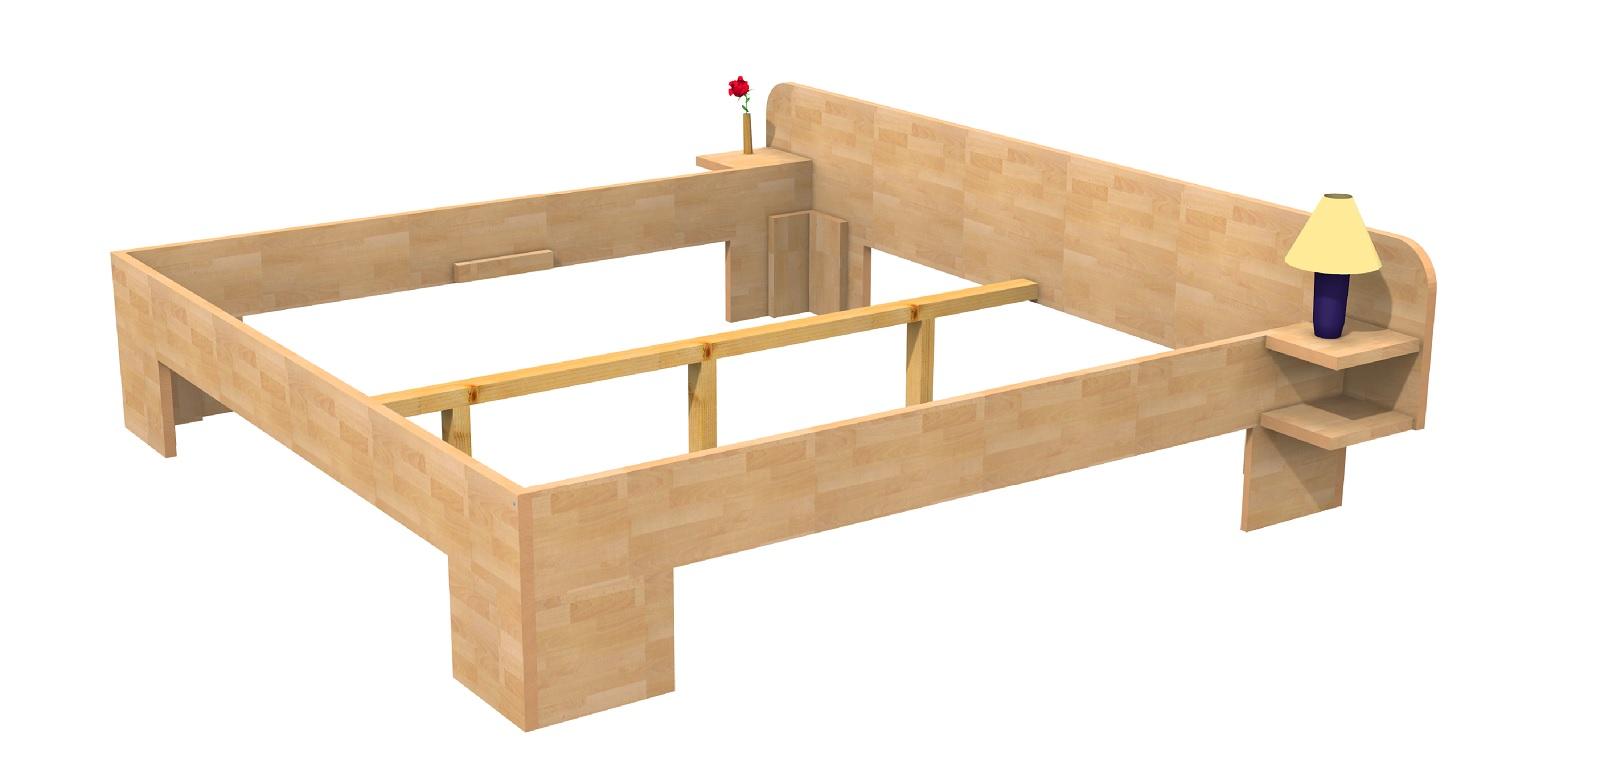 massivholzbett buche doppelbett fuss ii kopfteil 3 gerundet 140cm 30cm buche 200cm im. Black Bedroom Furniture Sets. Home Design Ideas